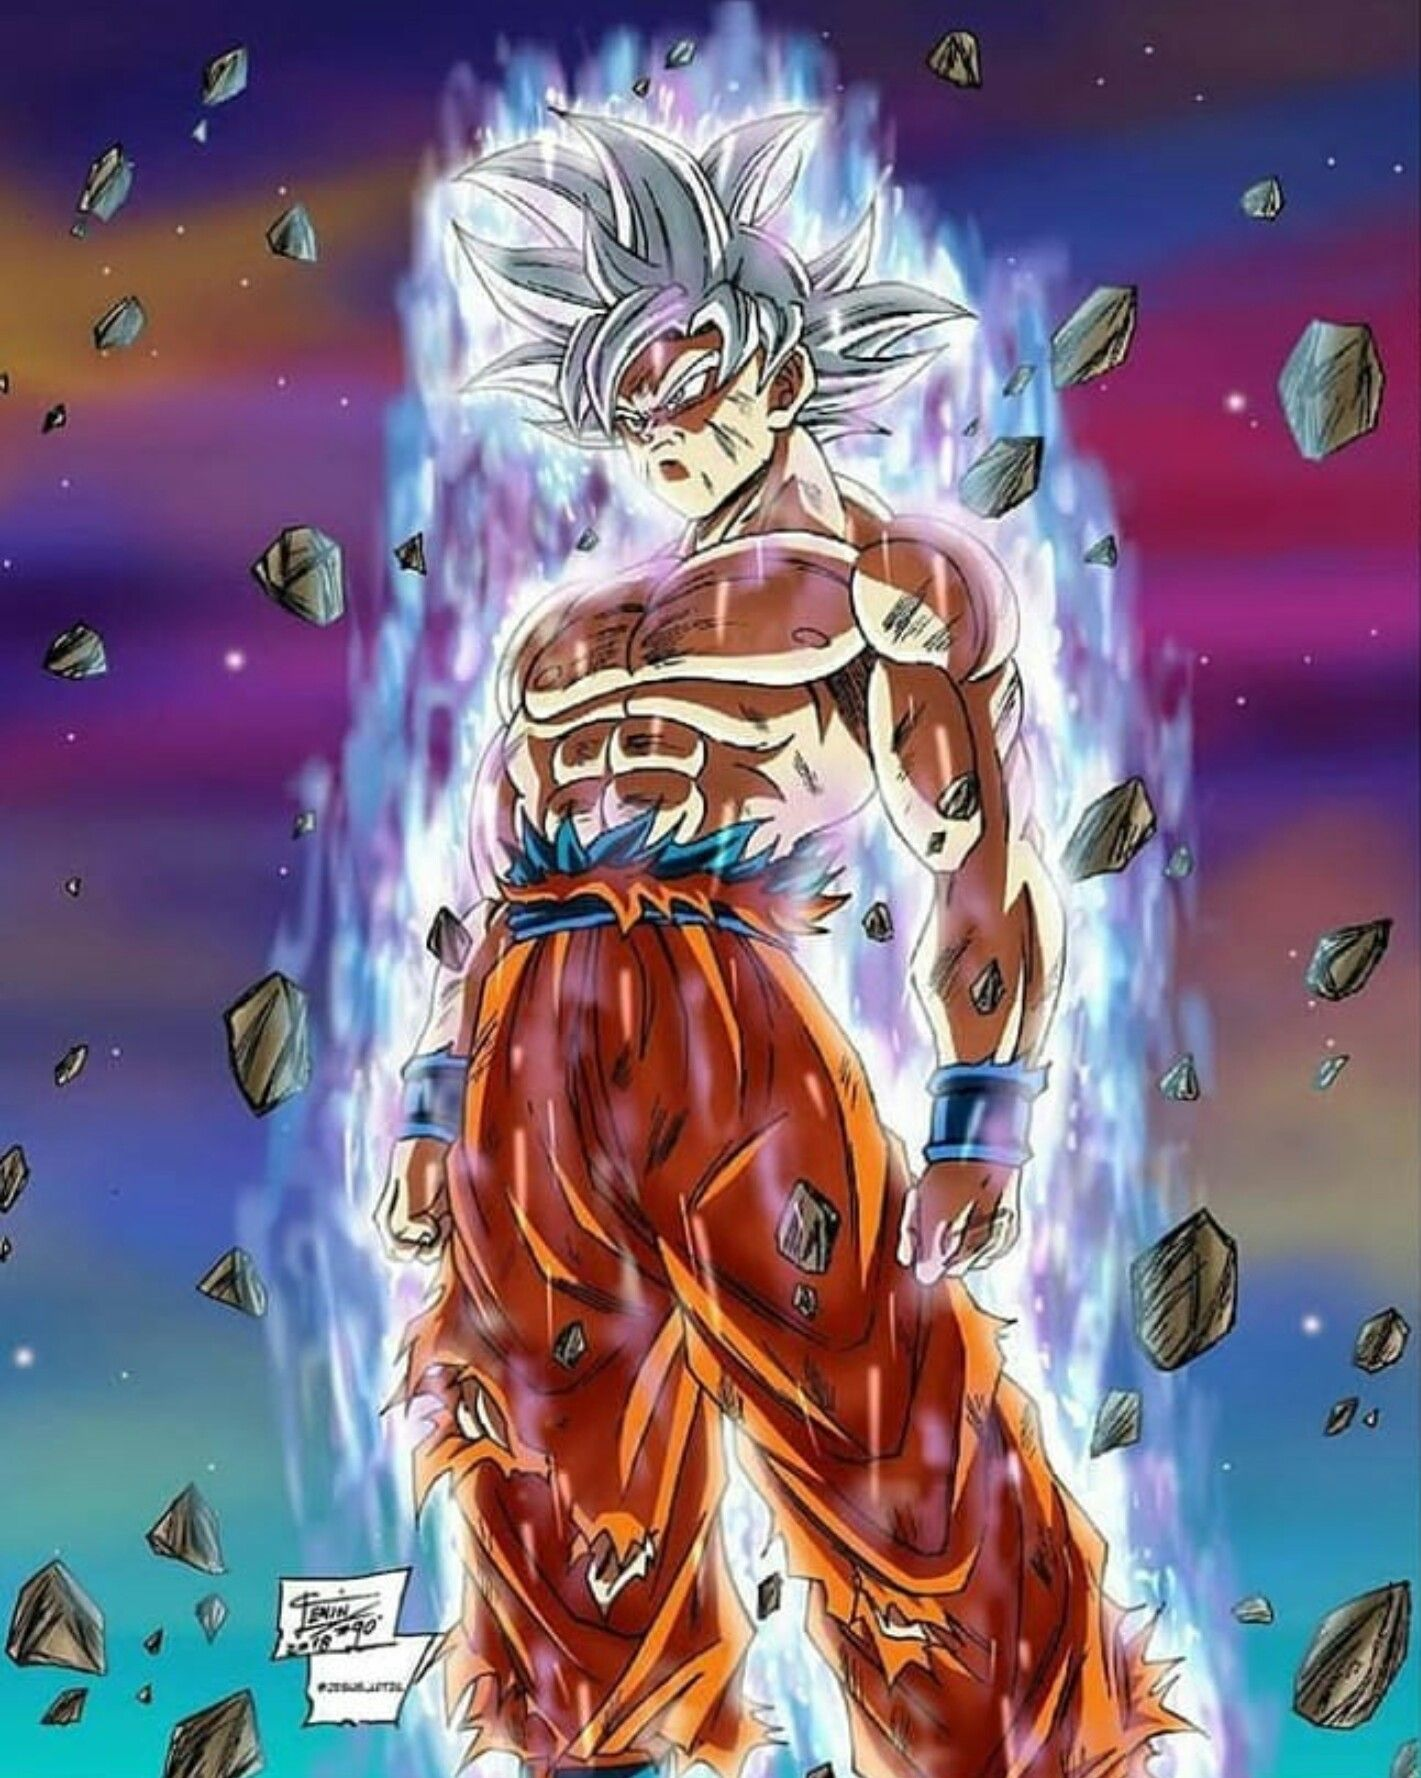 Dragon Ball Super By Reynaldo King On Mui Goku Vegito Anime Dragon